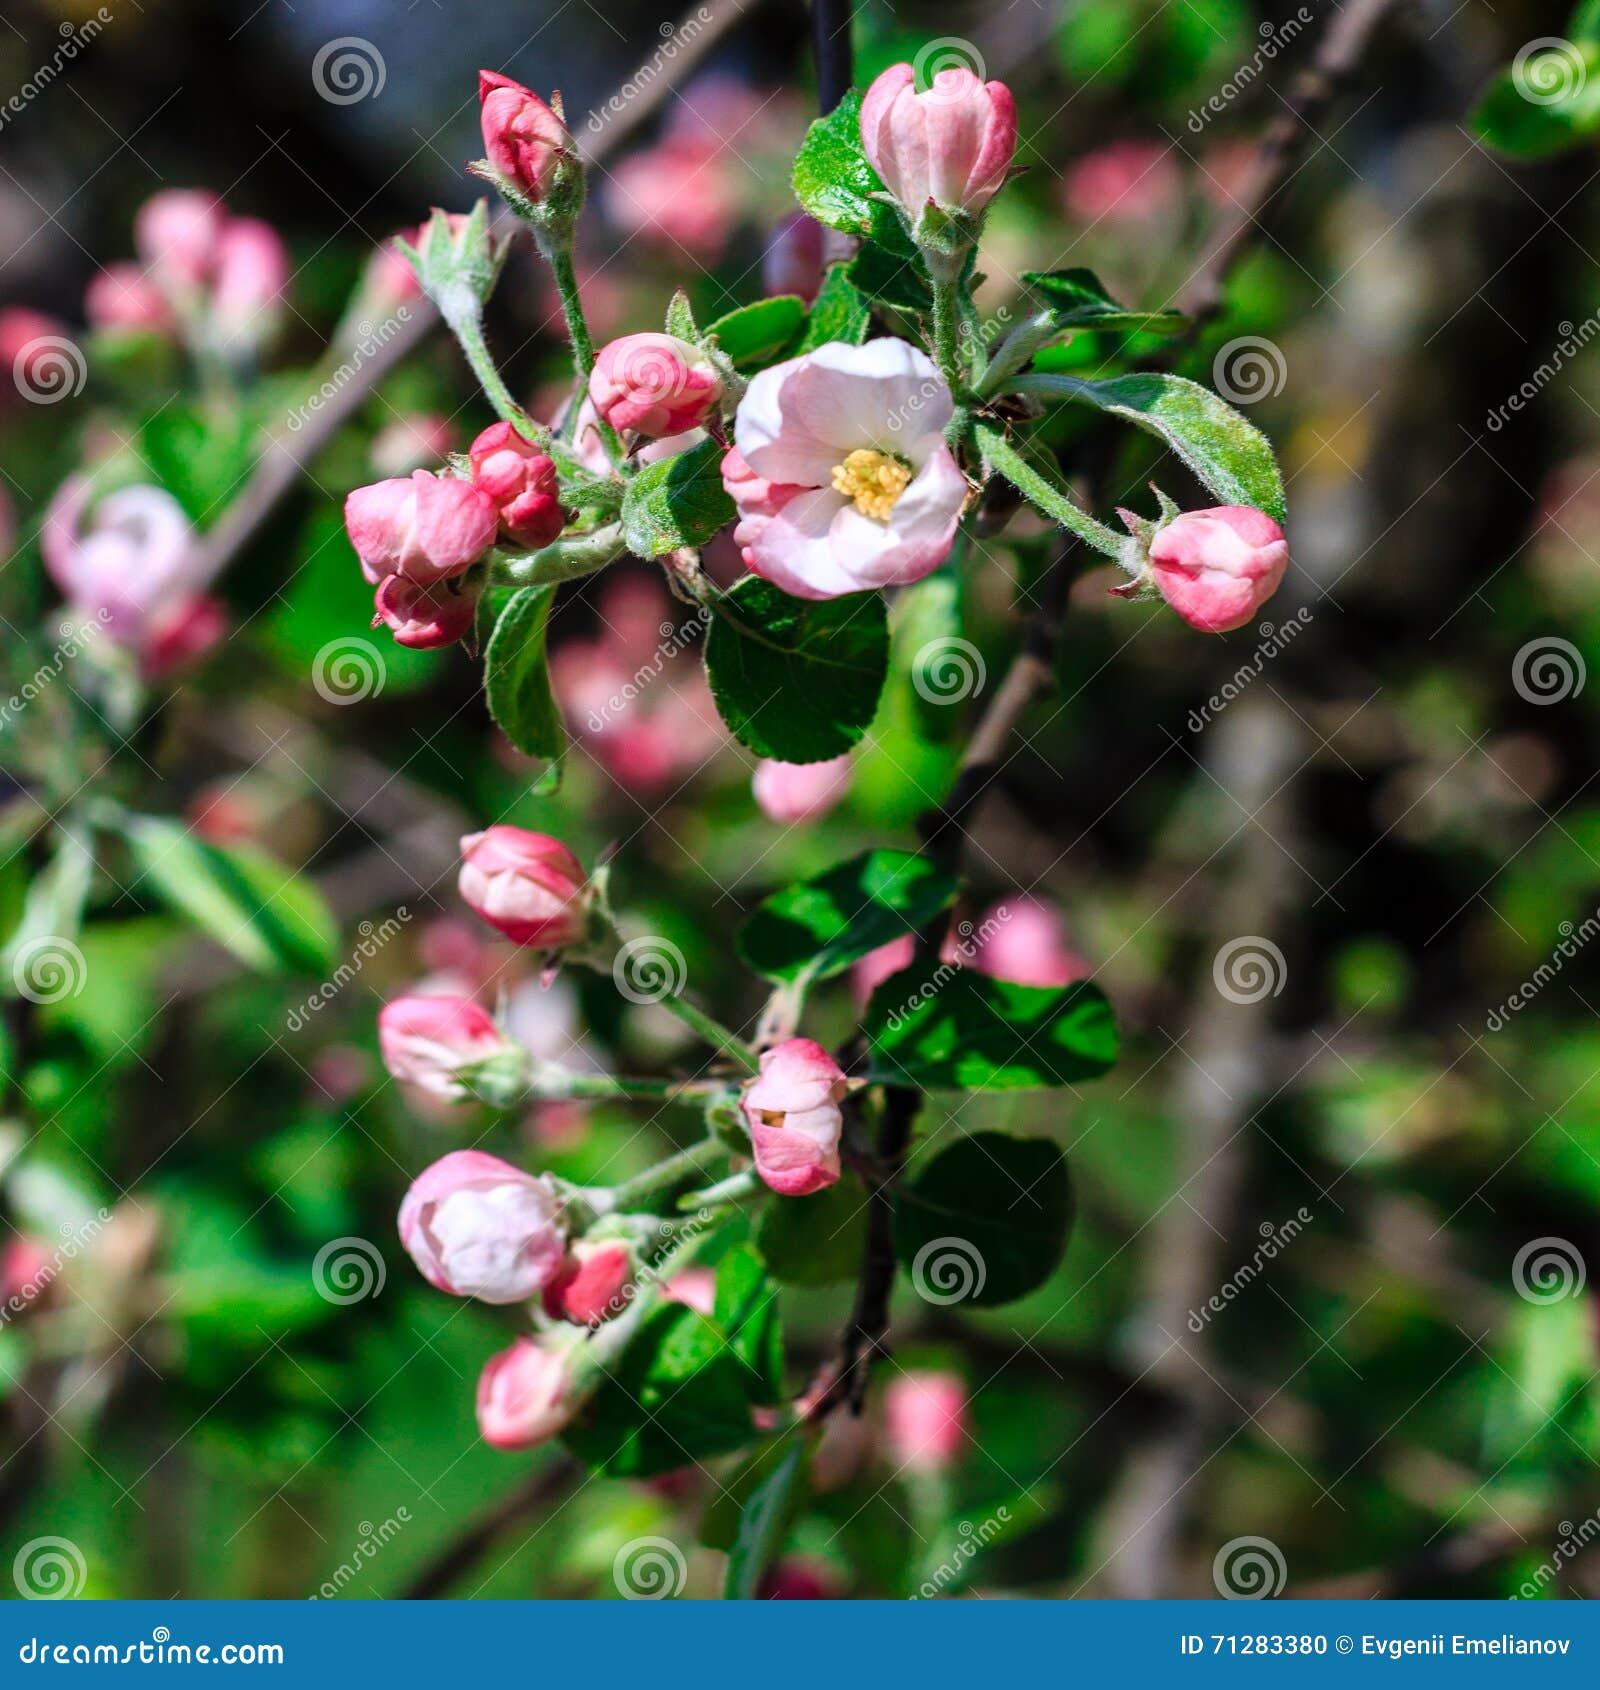 Flowers of the apple blossoms at spring season stock photo image flowers of the apple blossoms at spring season mightylinksfo